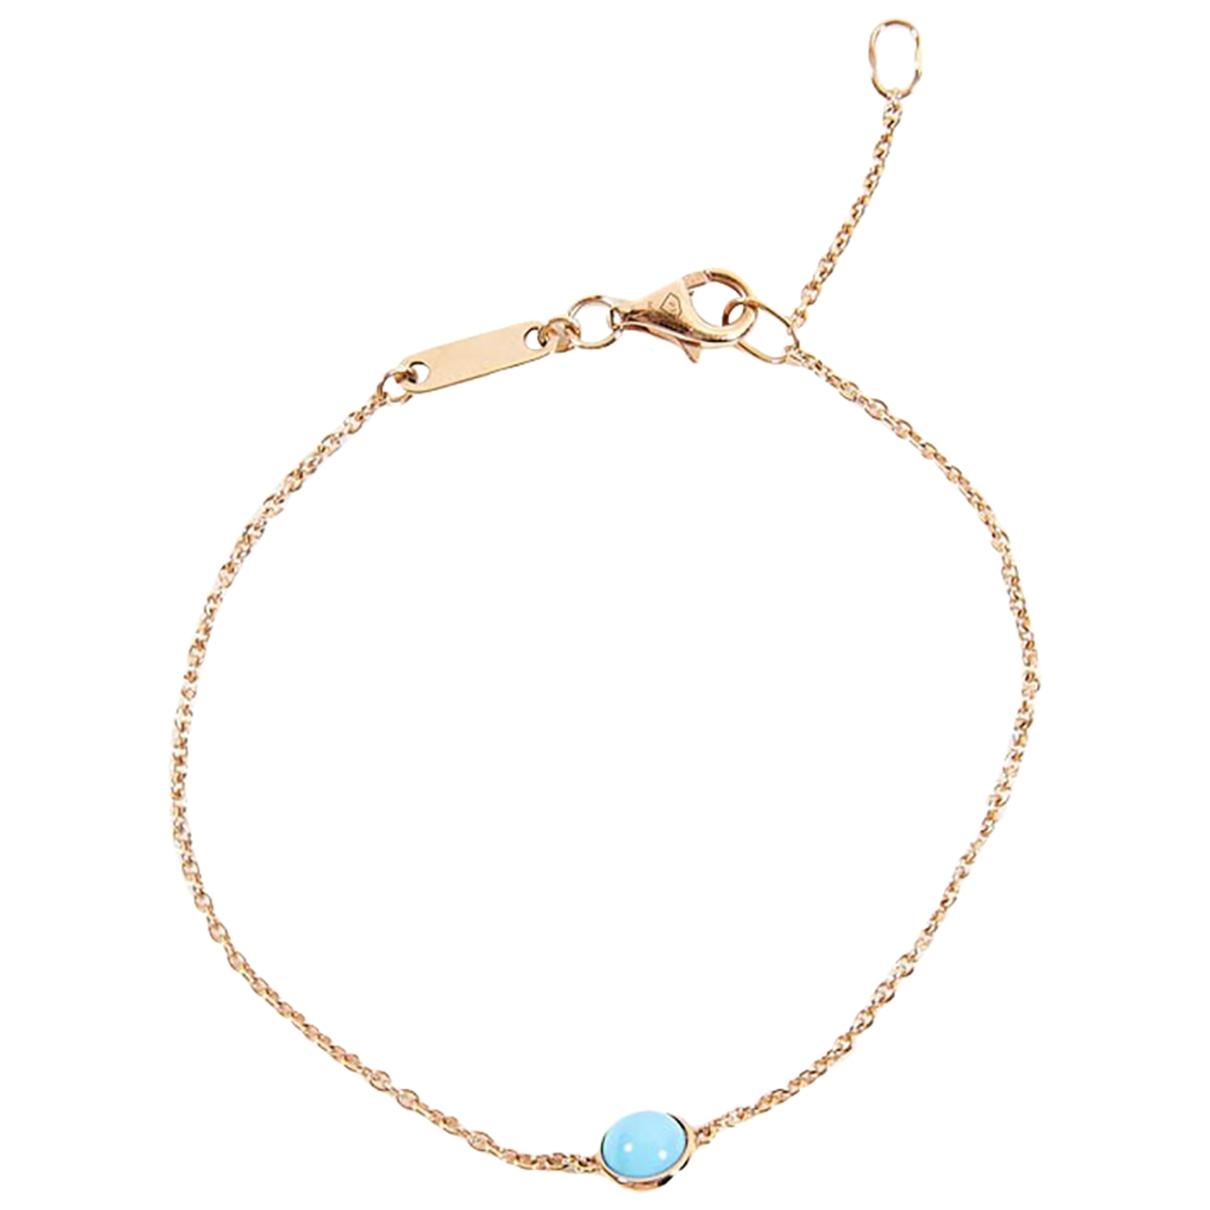 Piaget - Bracelet Possession pour femme en or rose - turquoise